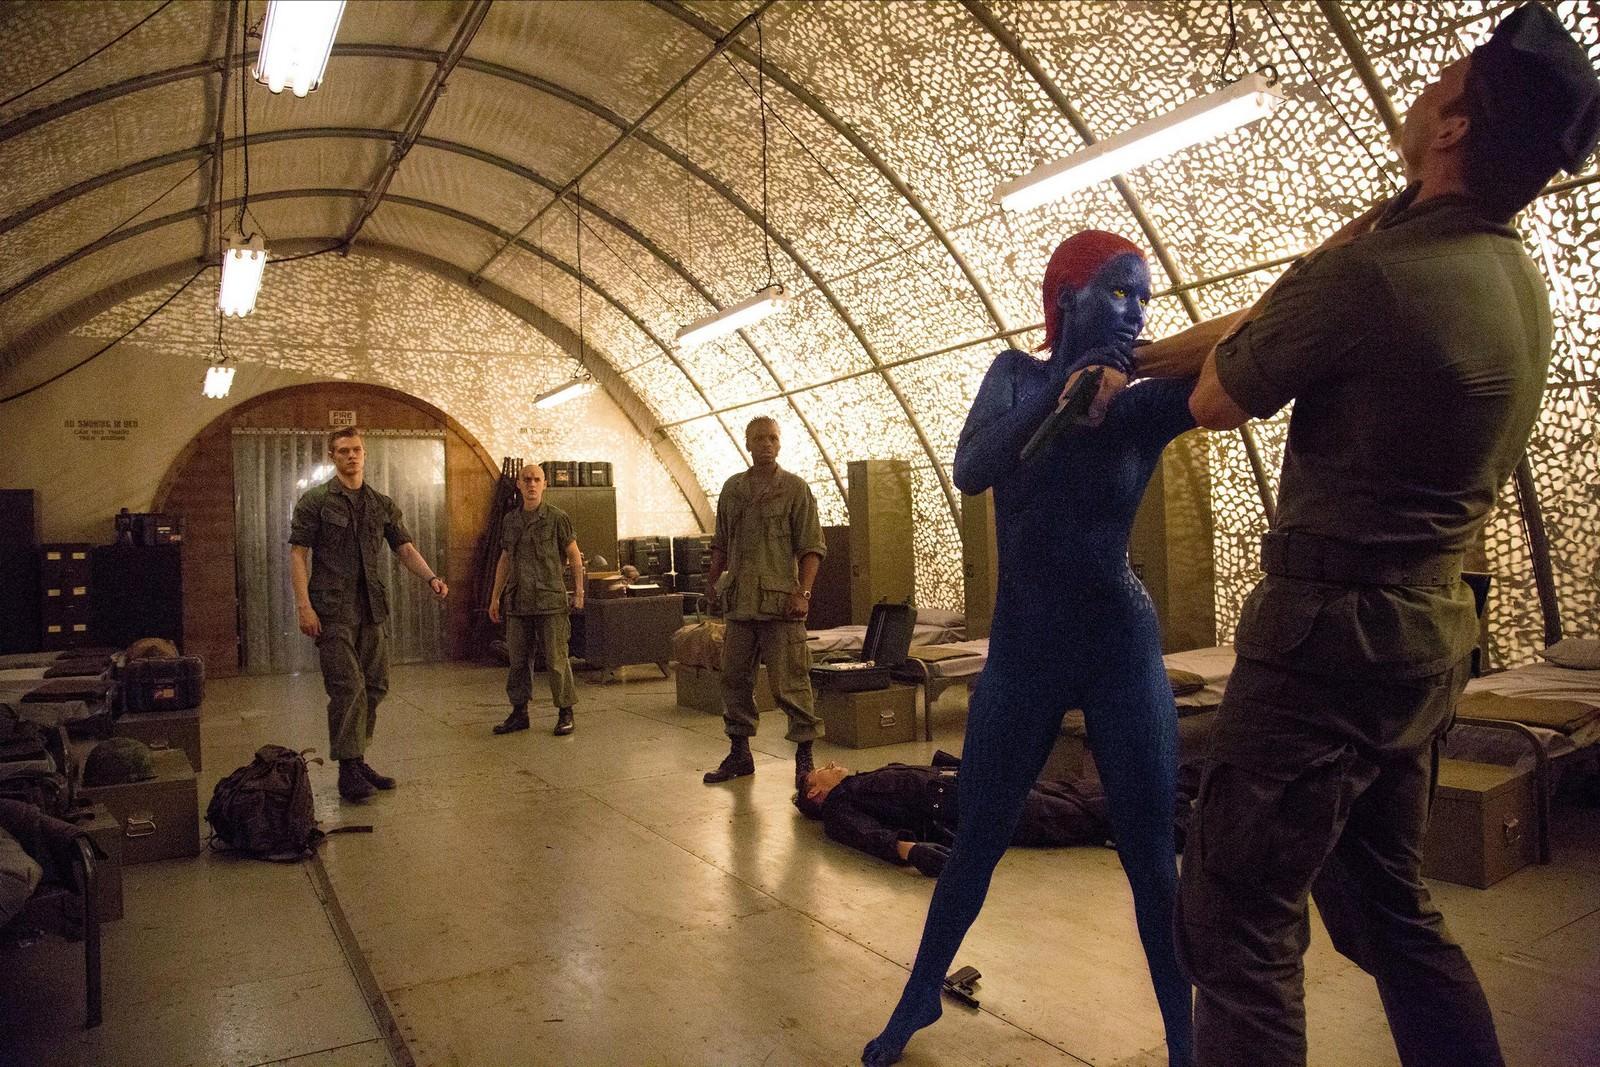 Movie, The Amazing Spider-Man 2(美國, 2014年) / 蜘蛛人驚奇再起2:電光之戰(台灣) / 超凡蜘蛛侠2(中國) / 蜘蛛俠2:決戰電魔(香港), 片尾劇情